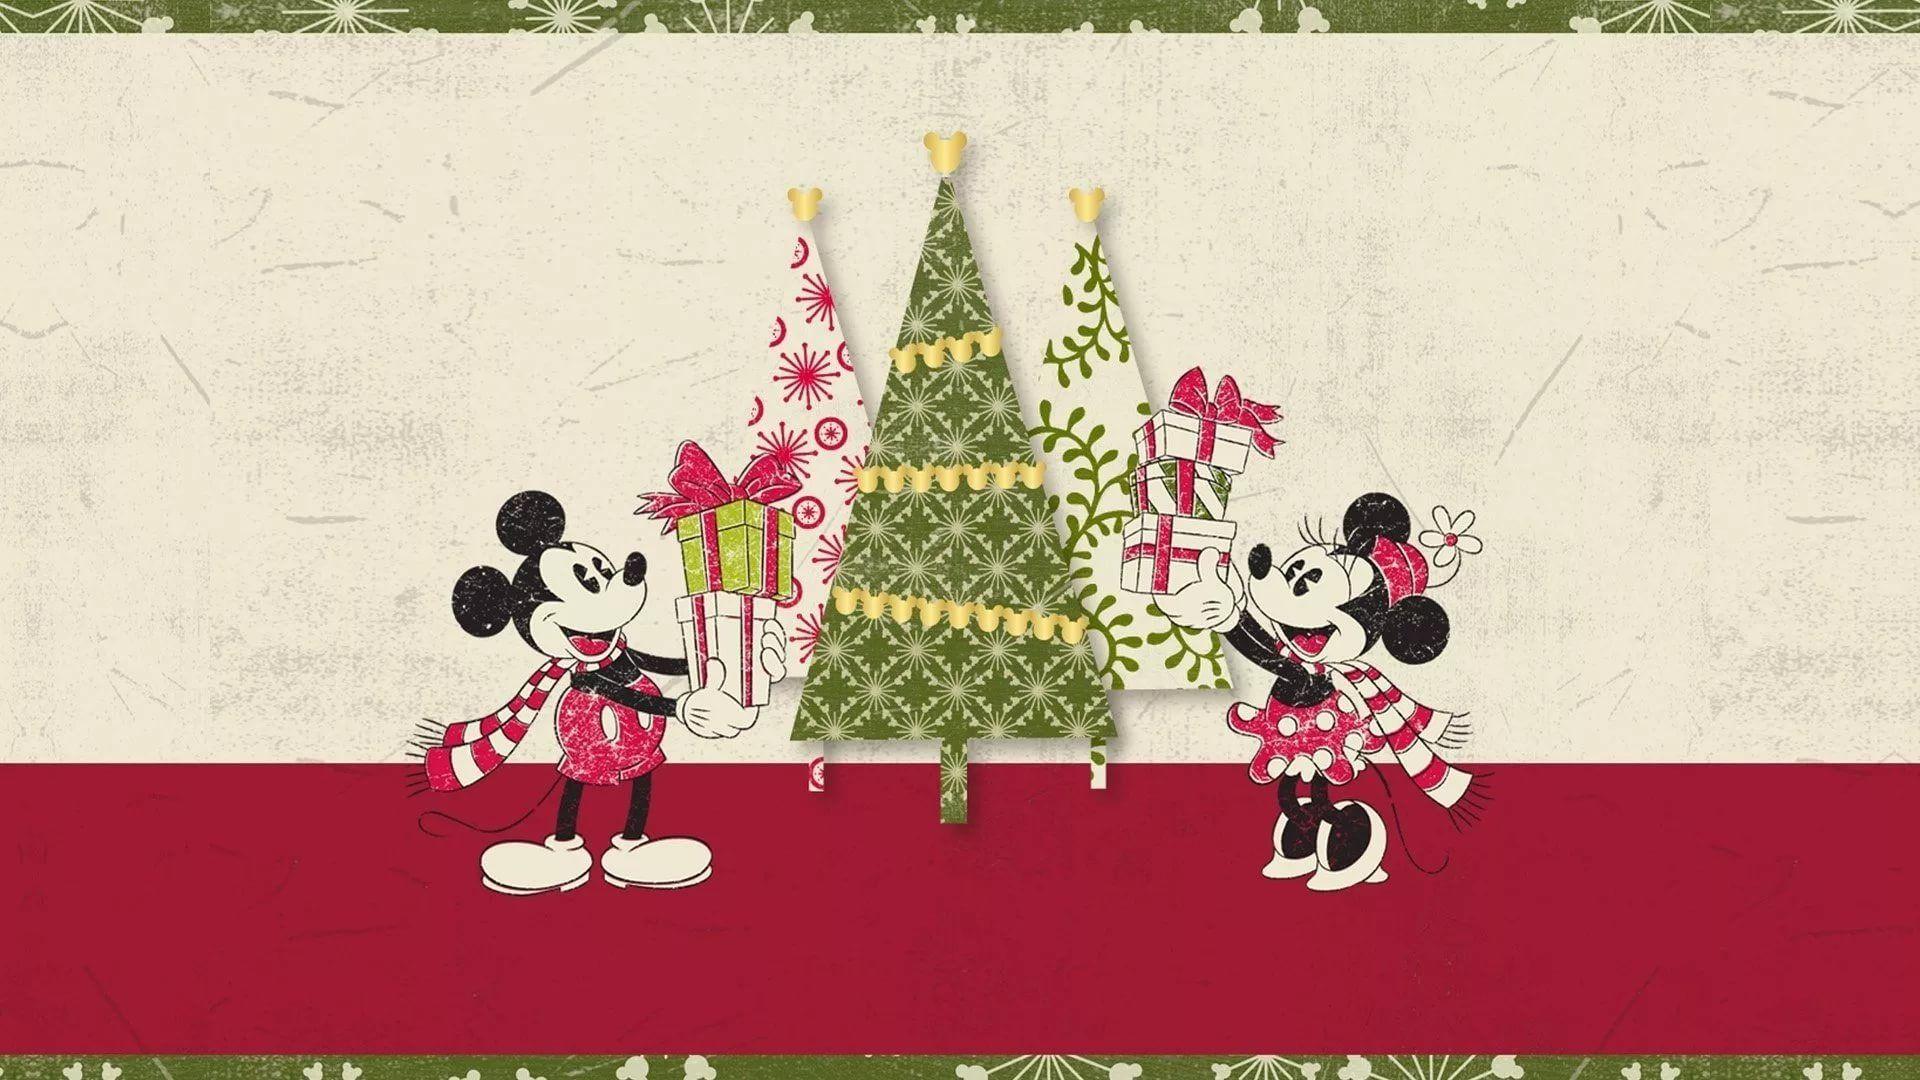 Disney Christmas best Wallpaper